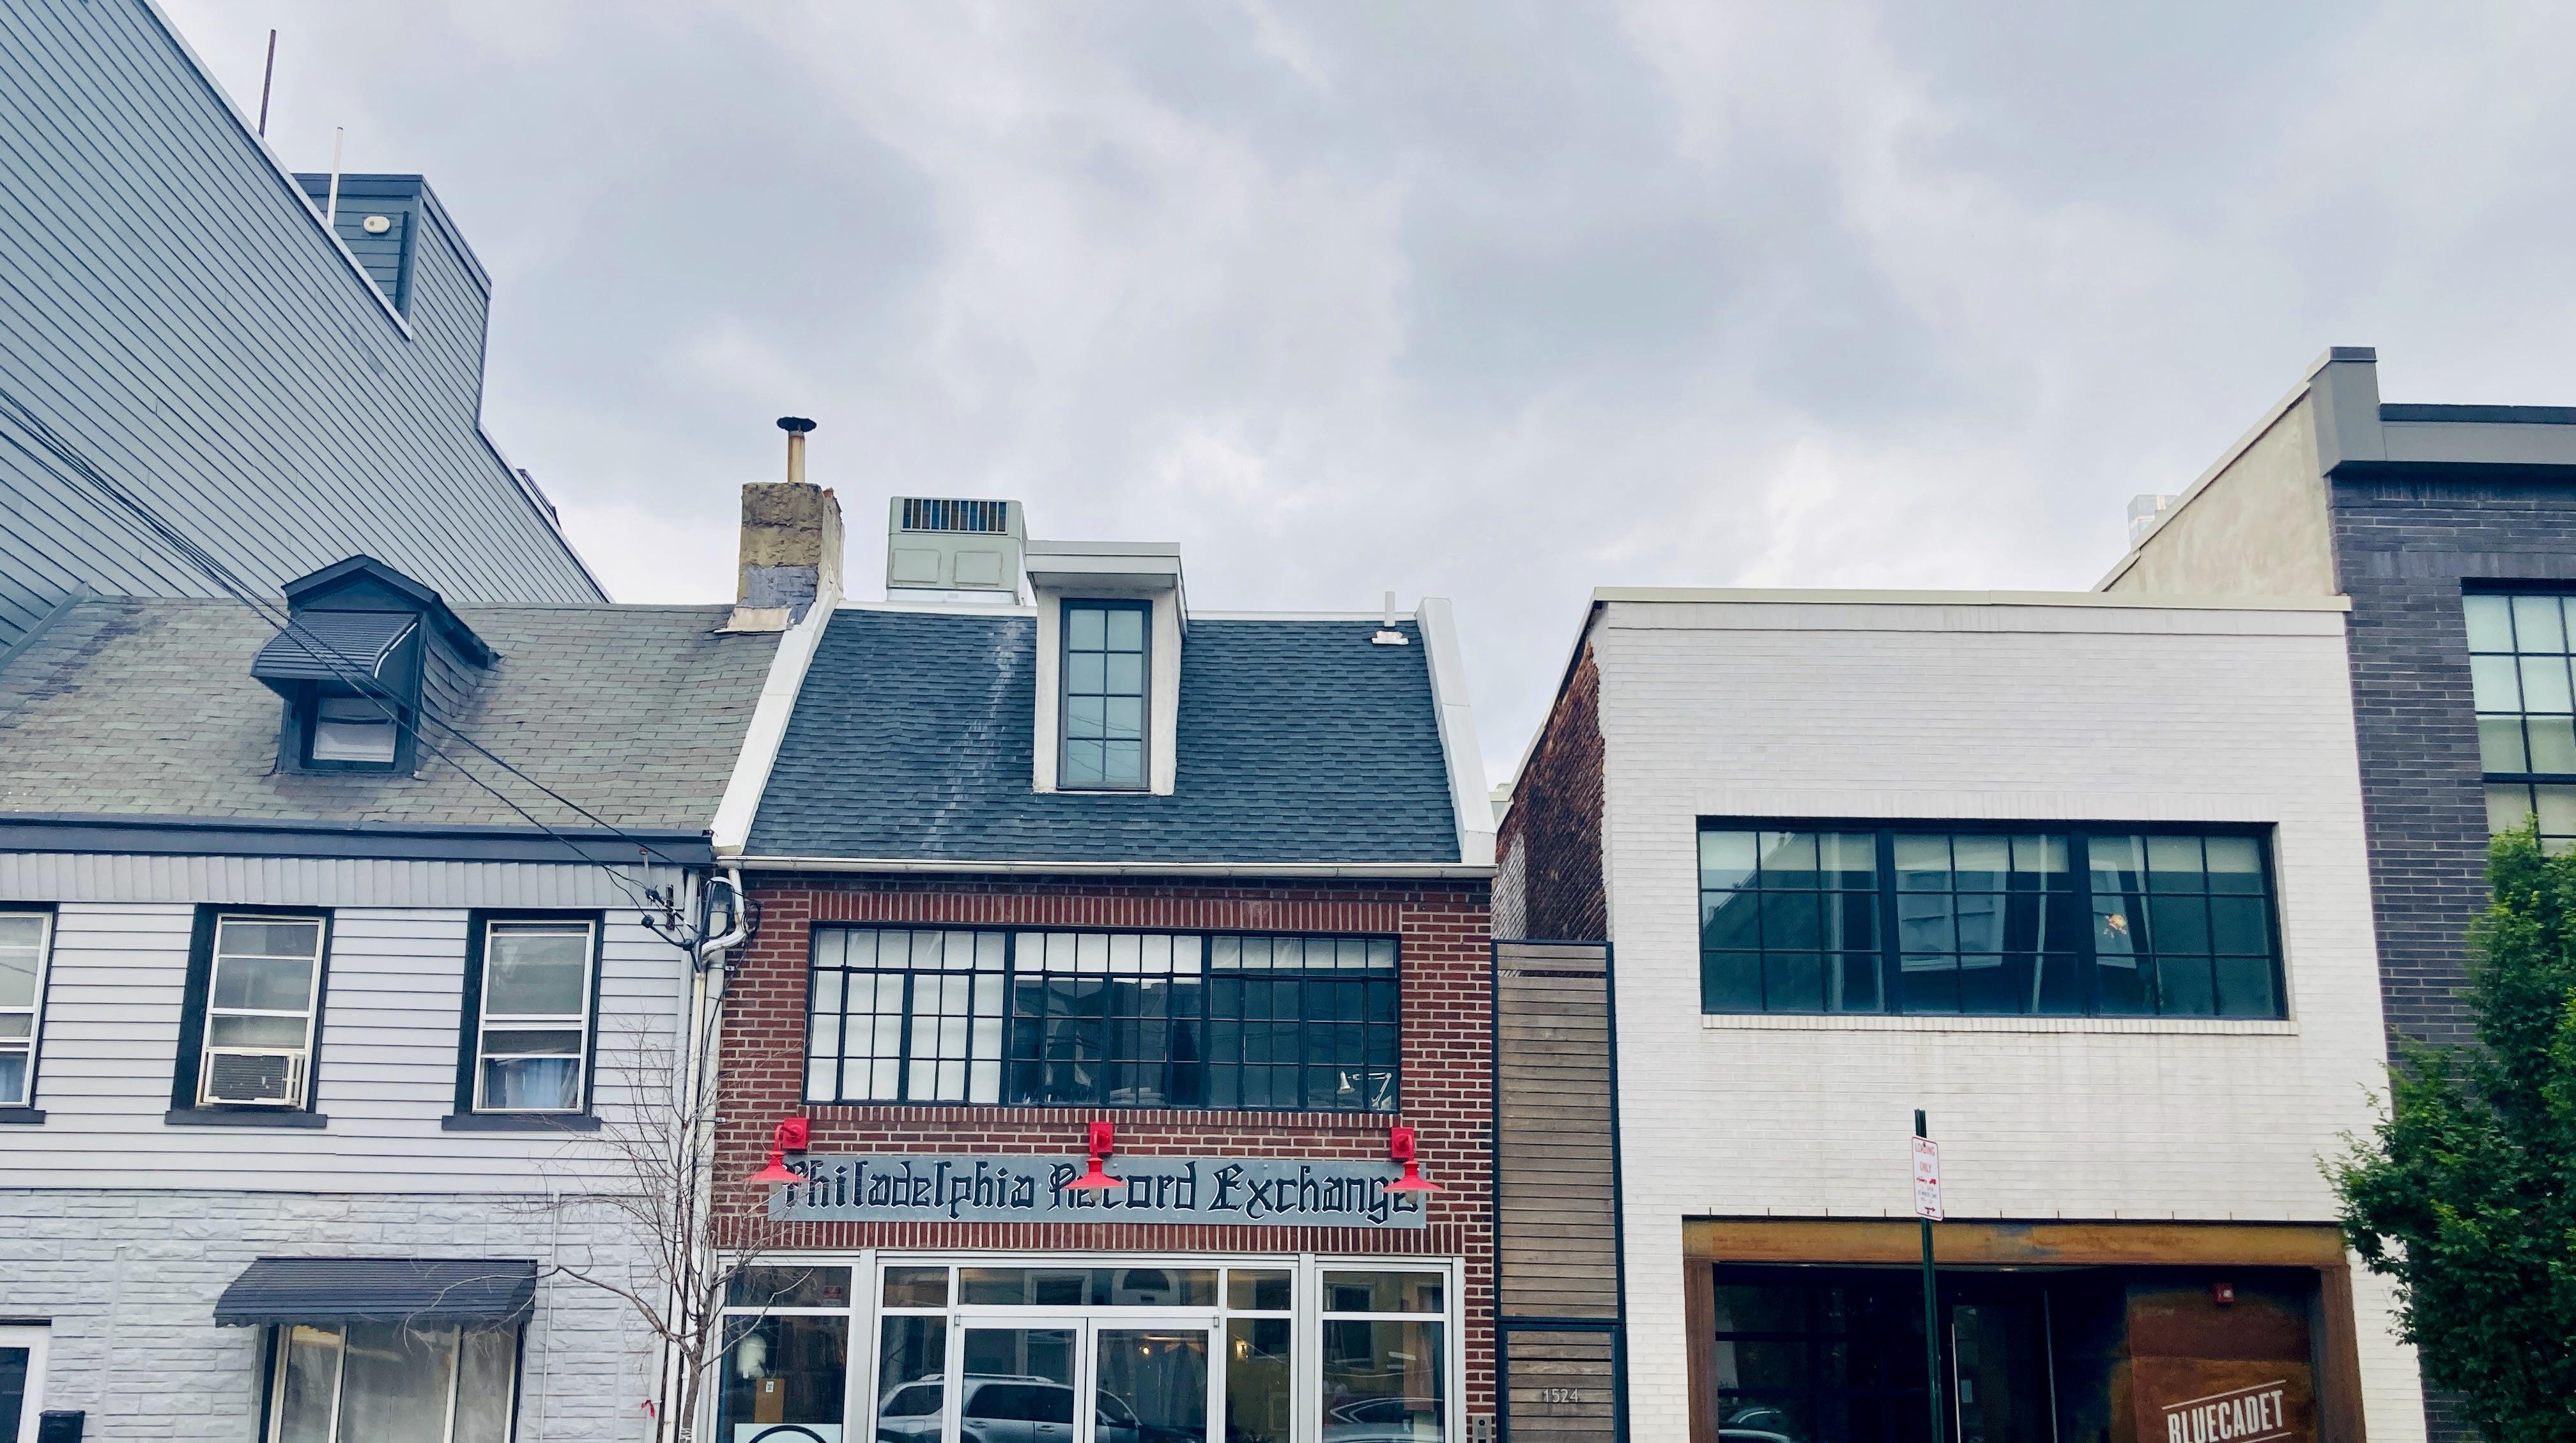 Philadelphia Record Exchange on Frankford Ave